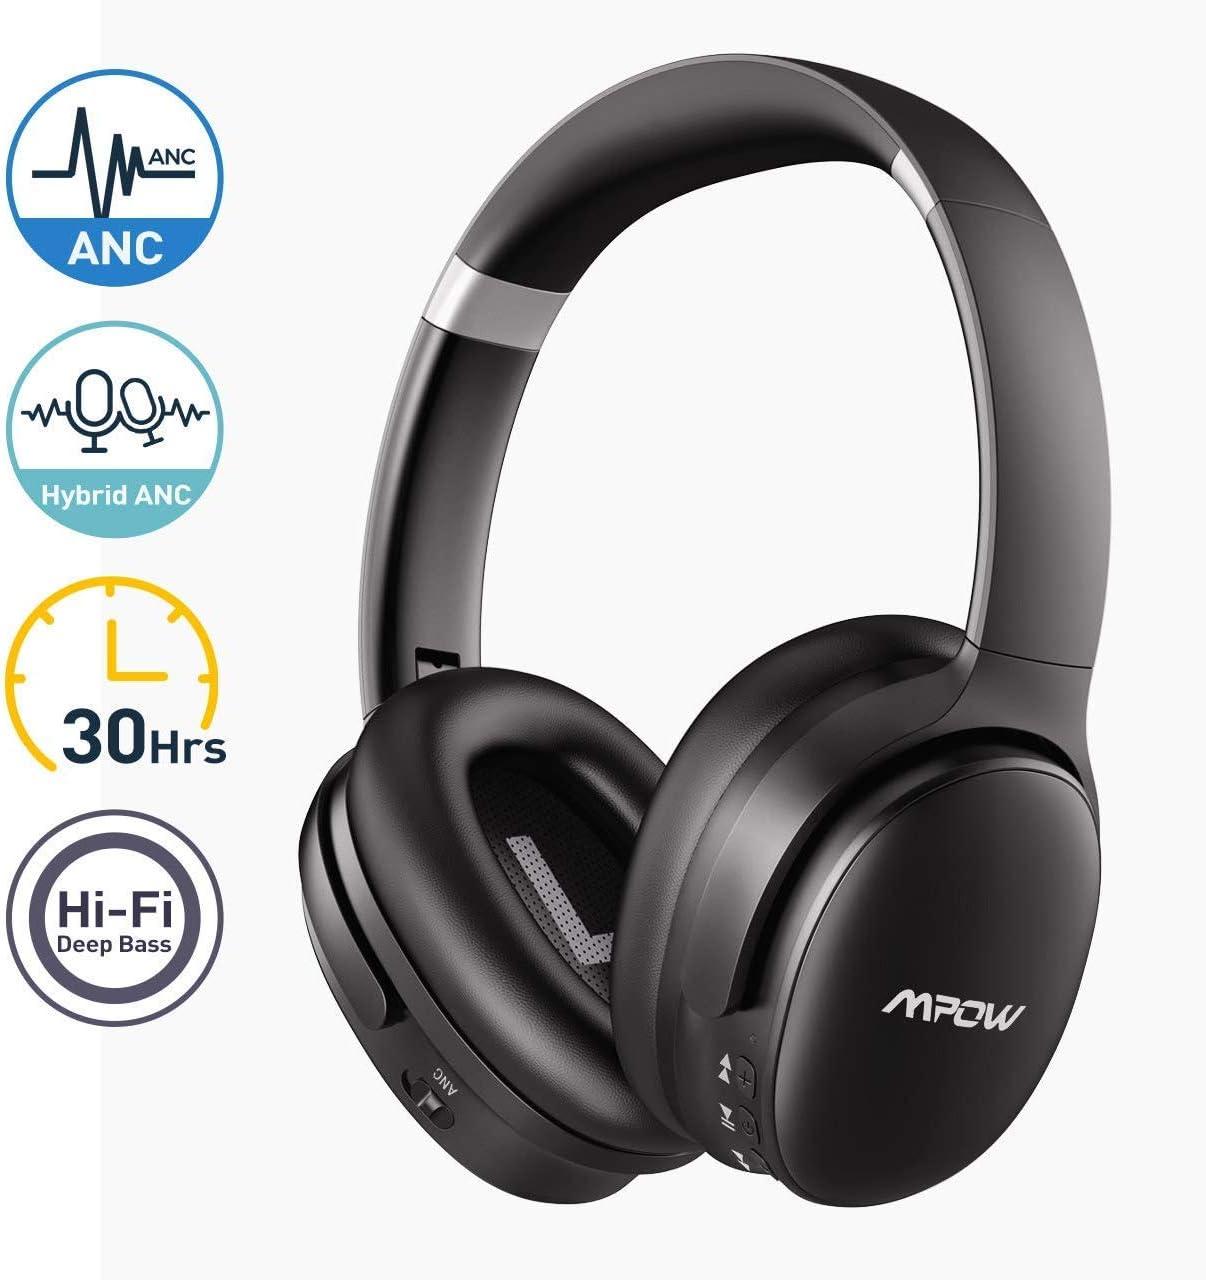 Mpow H10 Auriculares con Cancelación de Ruido Activo, 30 Hrs de Reproducción, CVC 6.0, Hi-Fi Sonido y Bajo Potente, Auriculares Diadema Bluetooth con Mic, Auriculares Plegable para TV/PC/Móvil